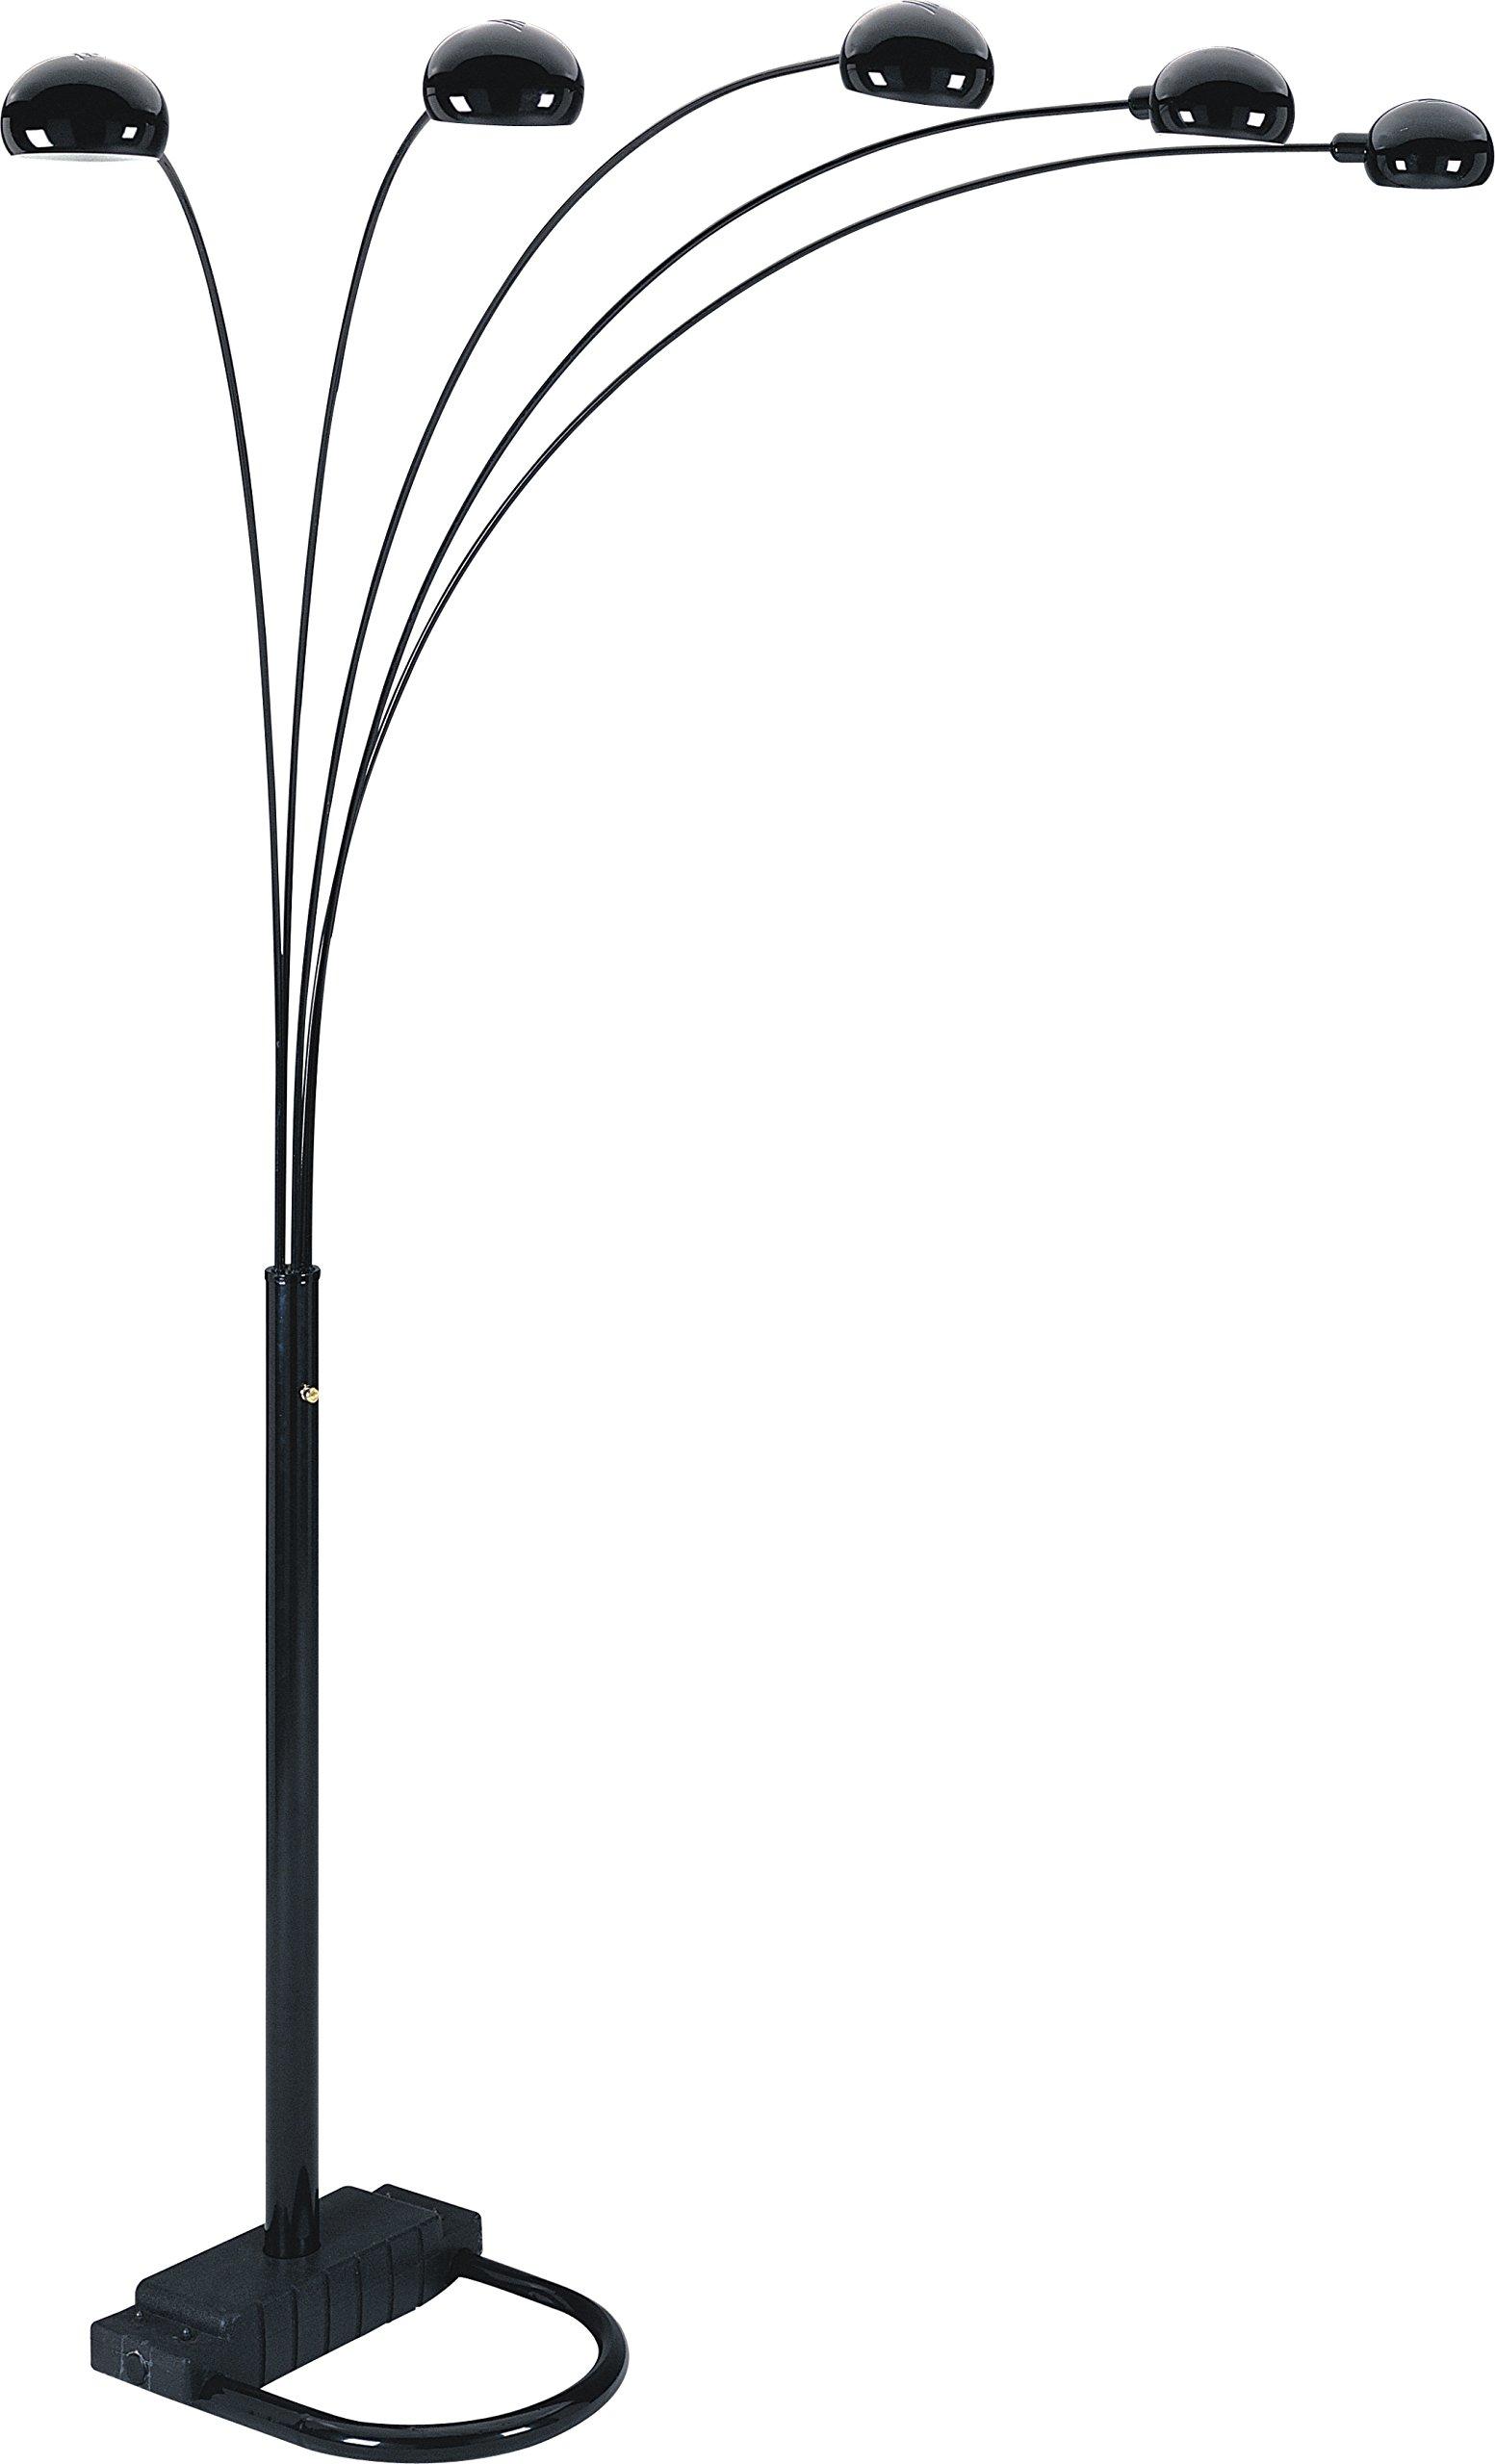 Milton Greens Stars Solomon Adjustable Arc Floor Lamp, 84-Inch, Black